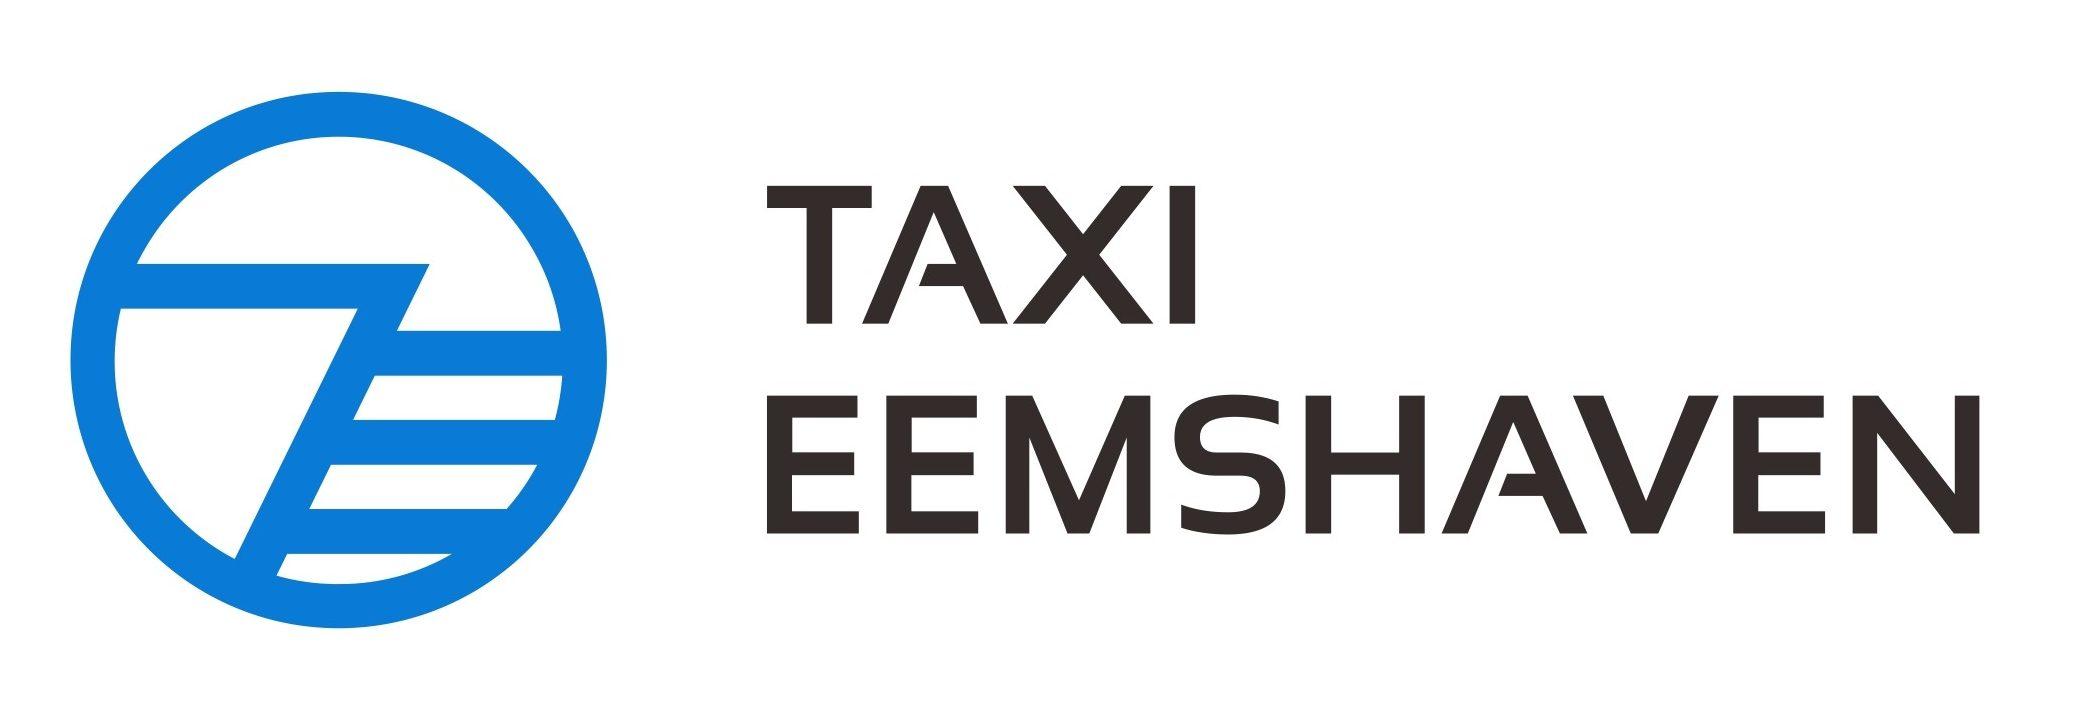 Taxi Eemshaven